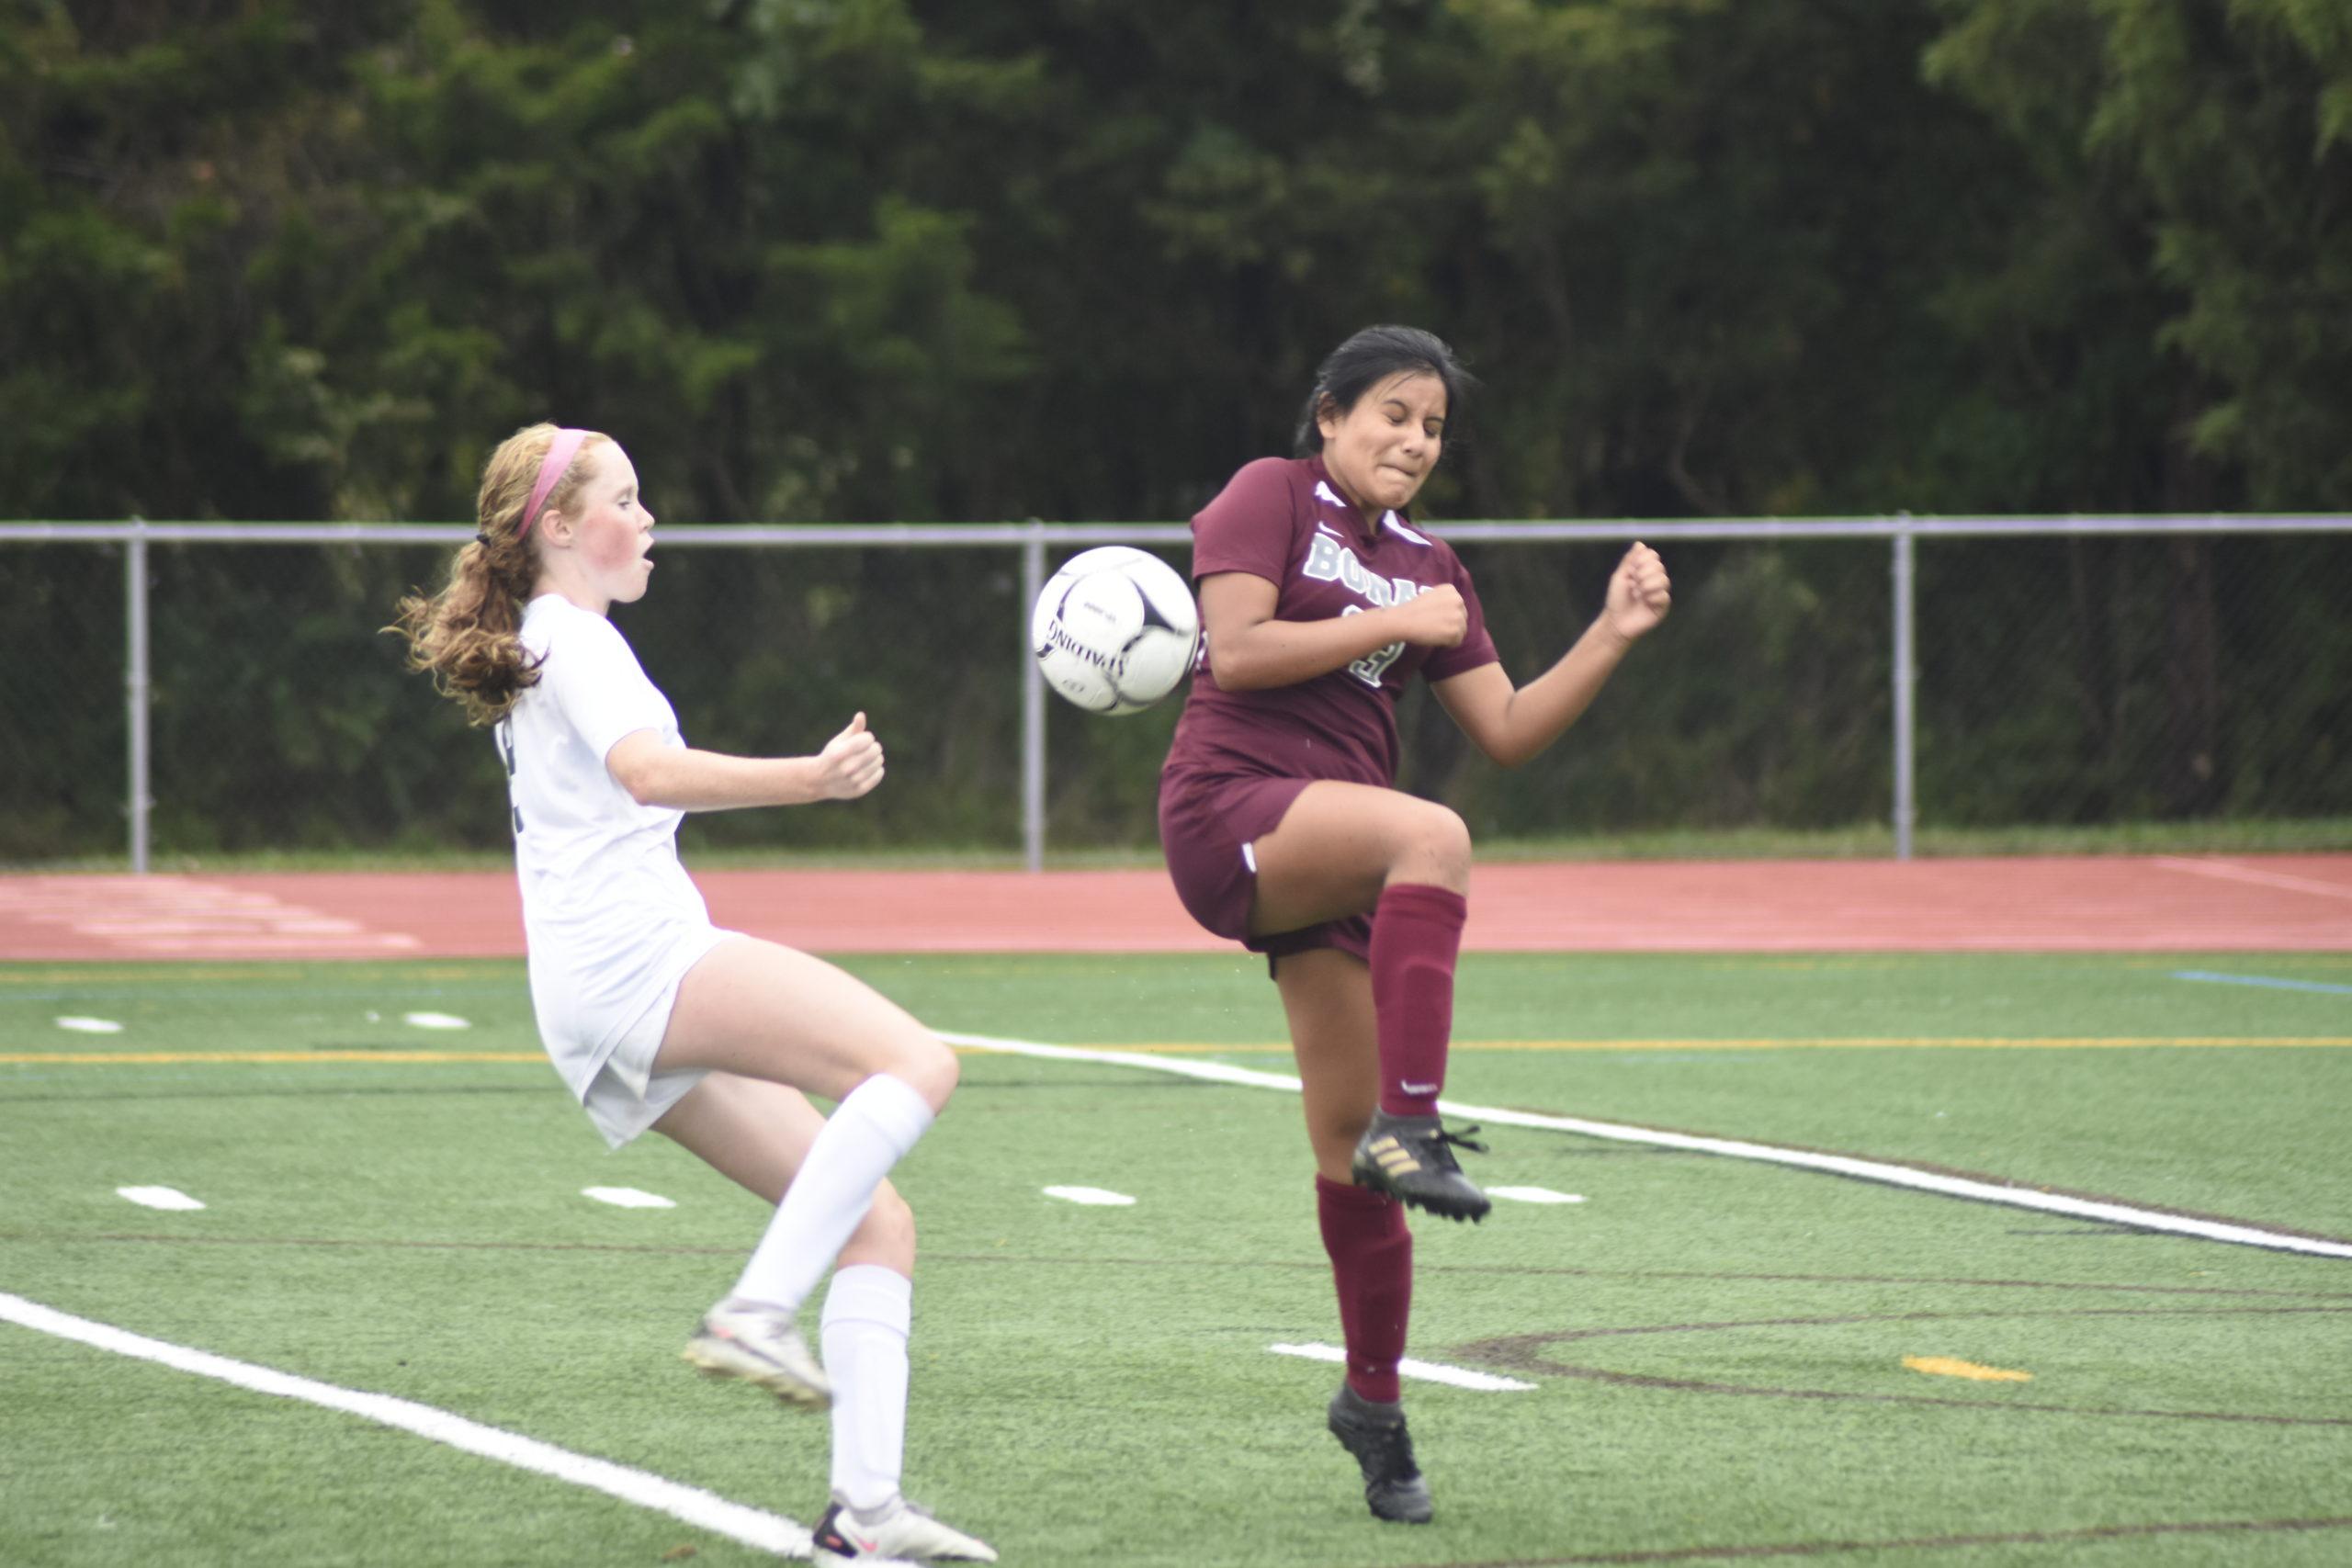 East Hampton junior Jocelyn Prieto blocks a ball sent by Westhampton Beach sophomore Sarah Gormley.